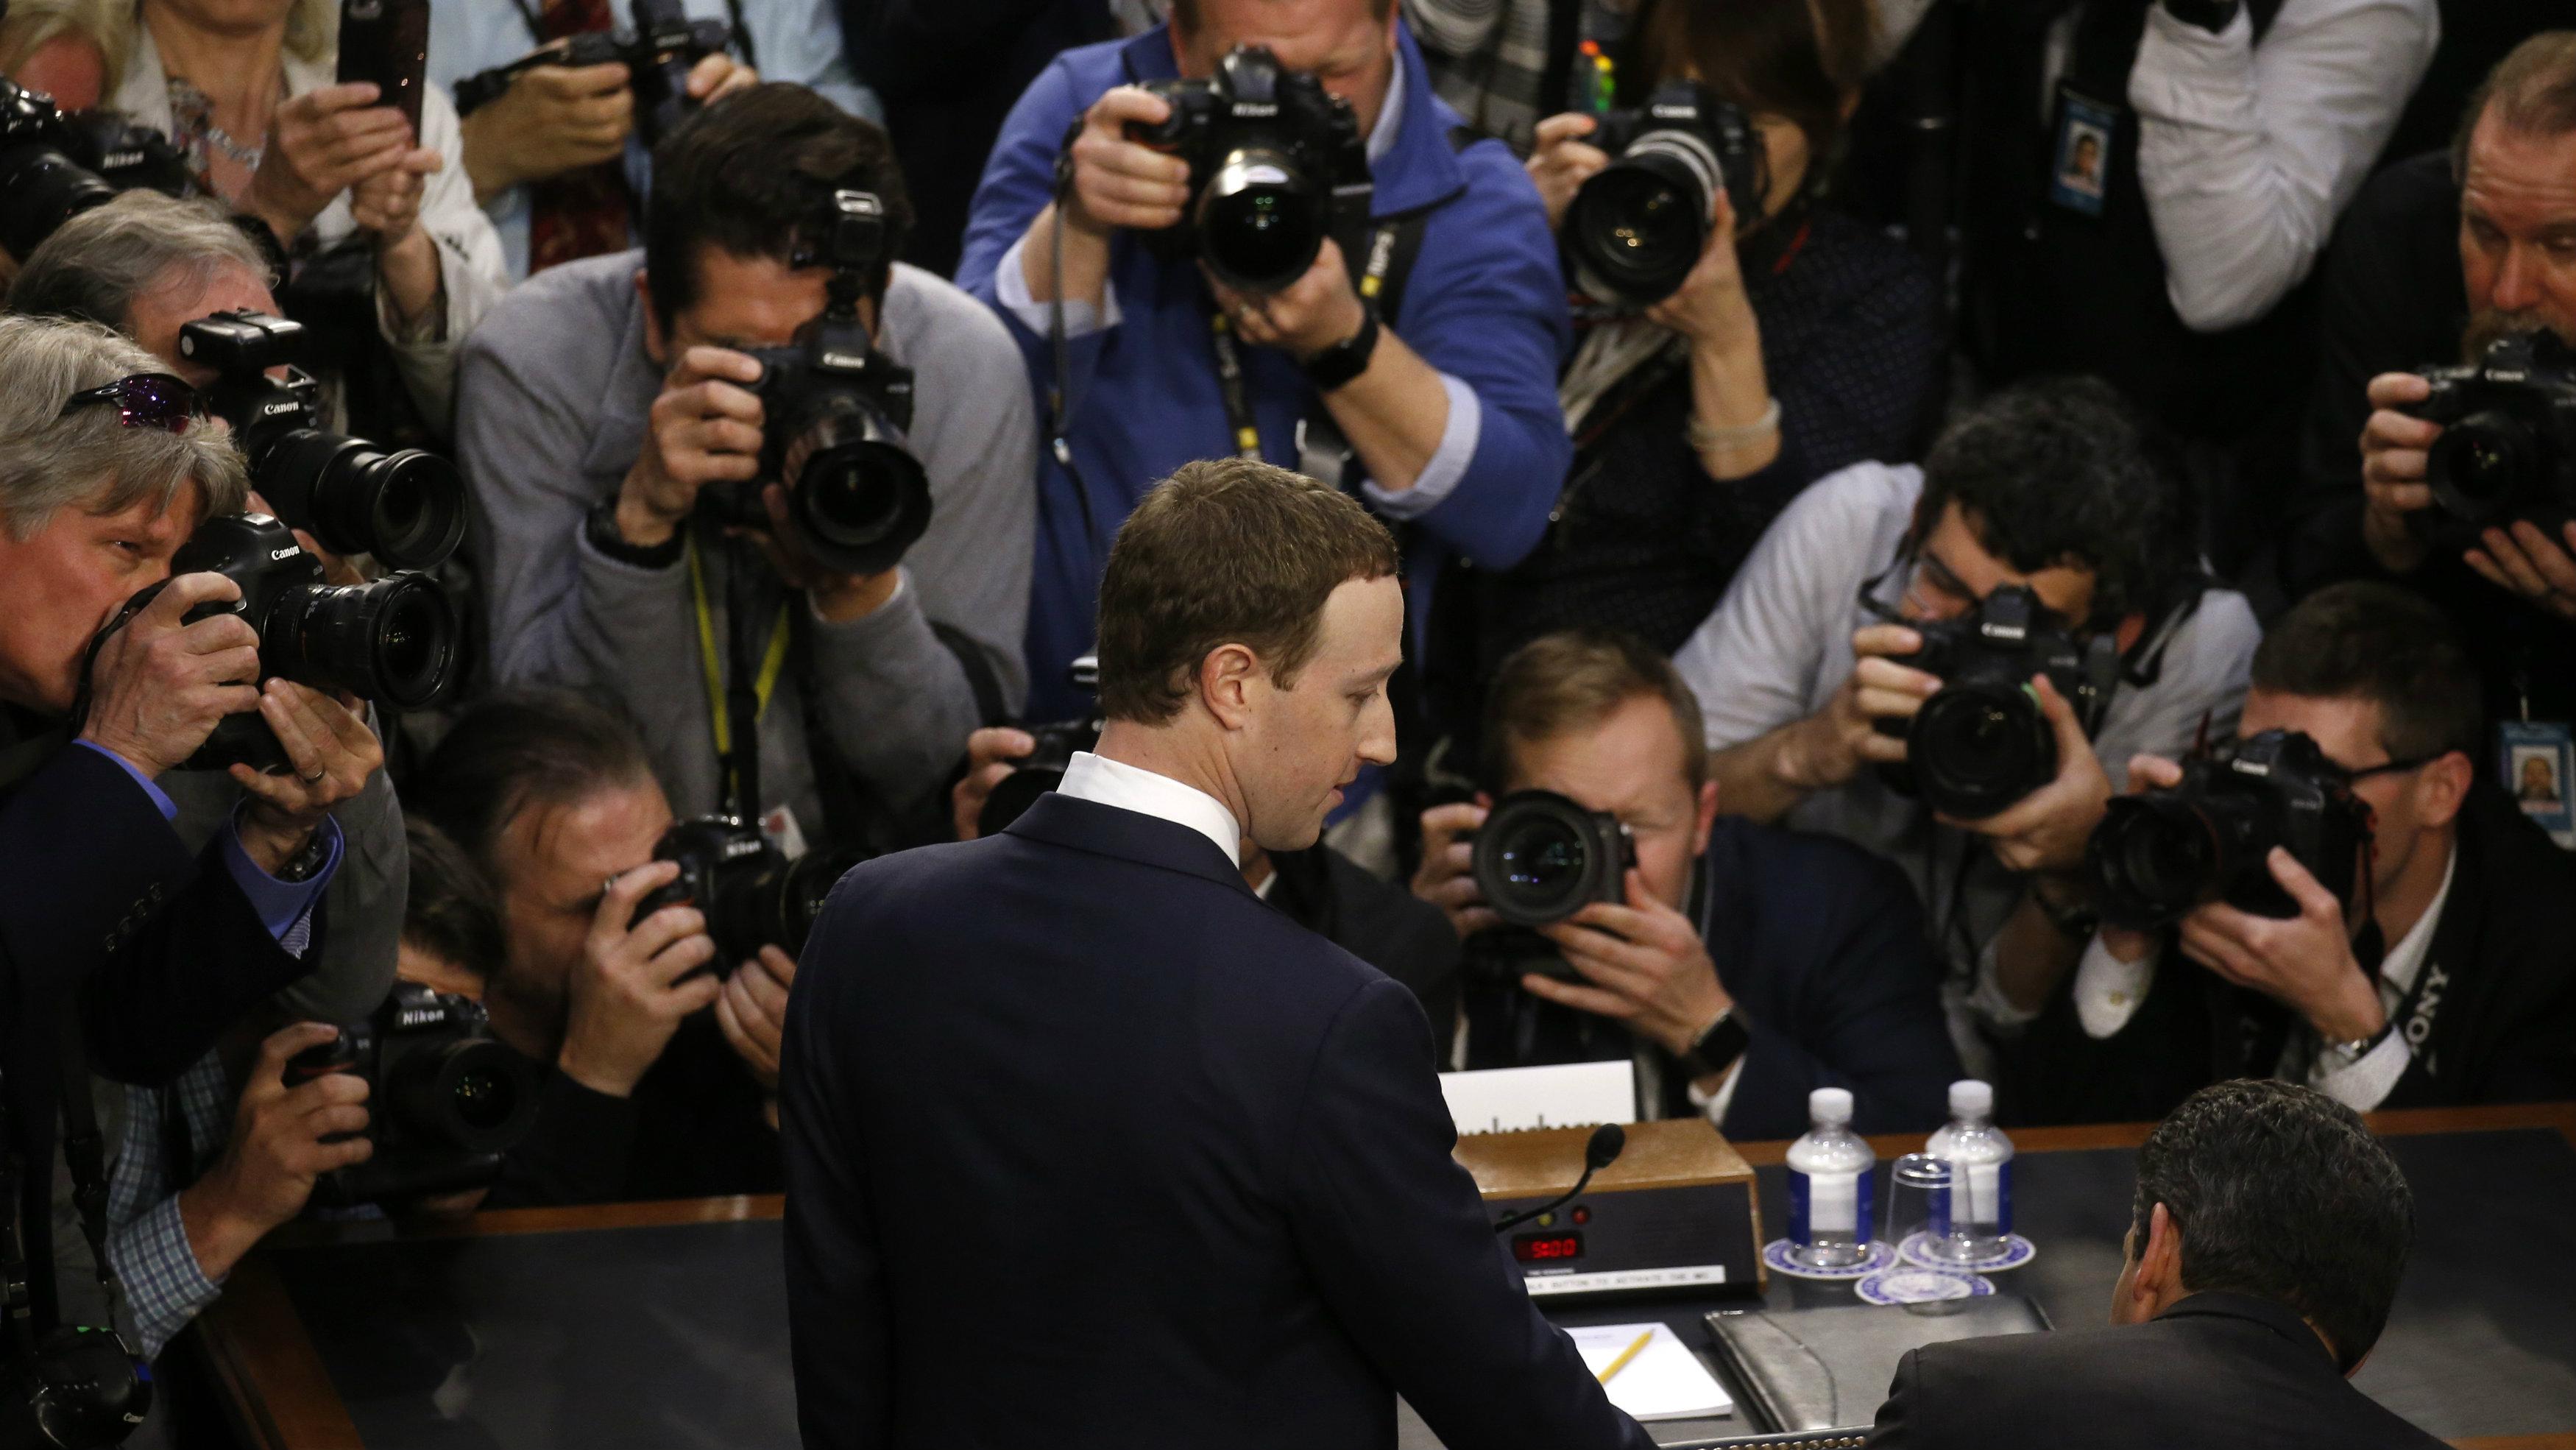 Facebook CEO Mark Zuckerberg arrives to testify before Senate committees